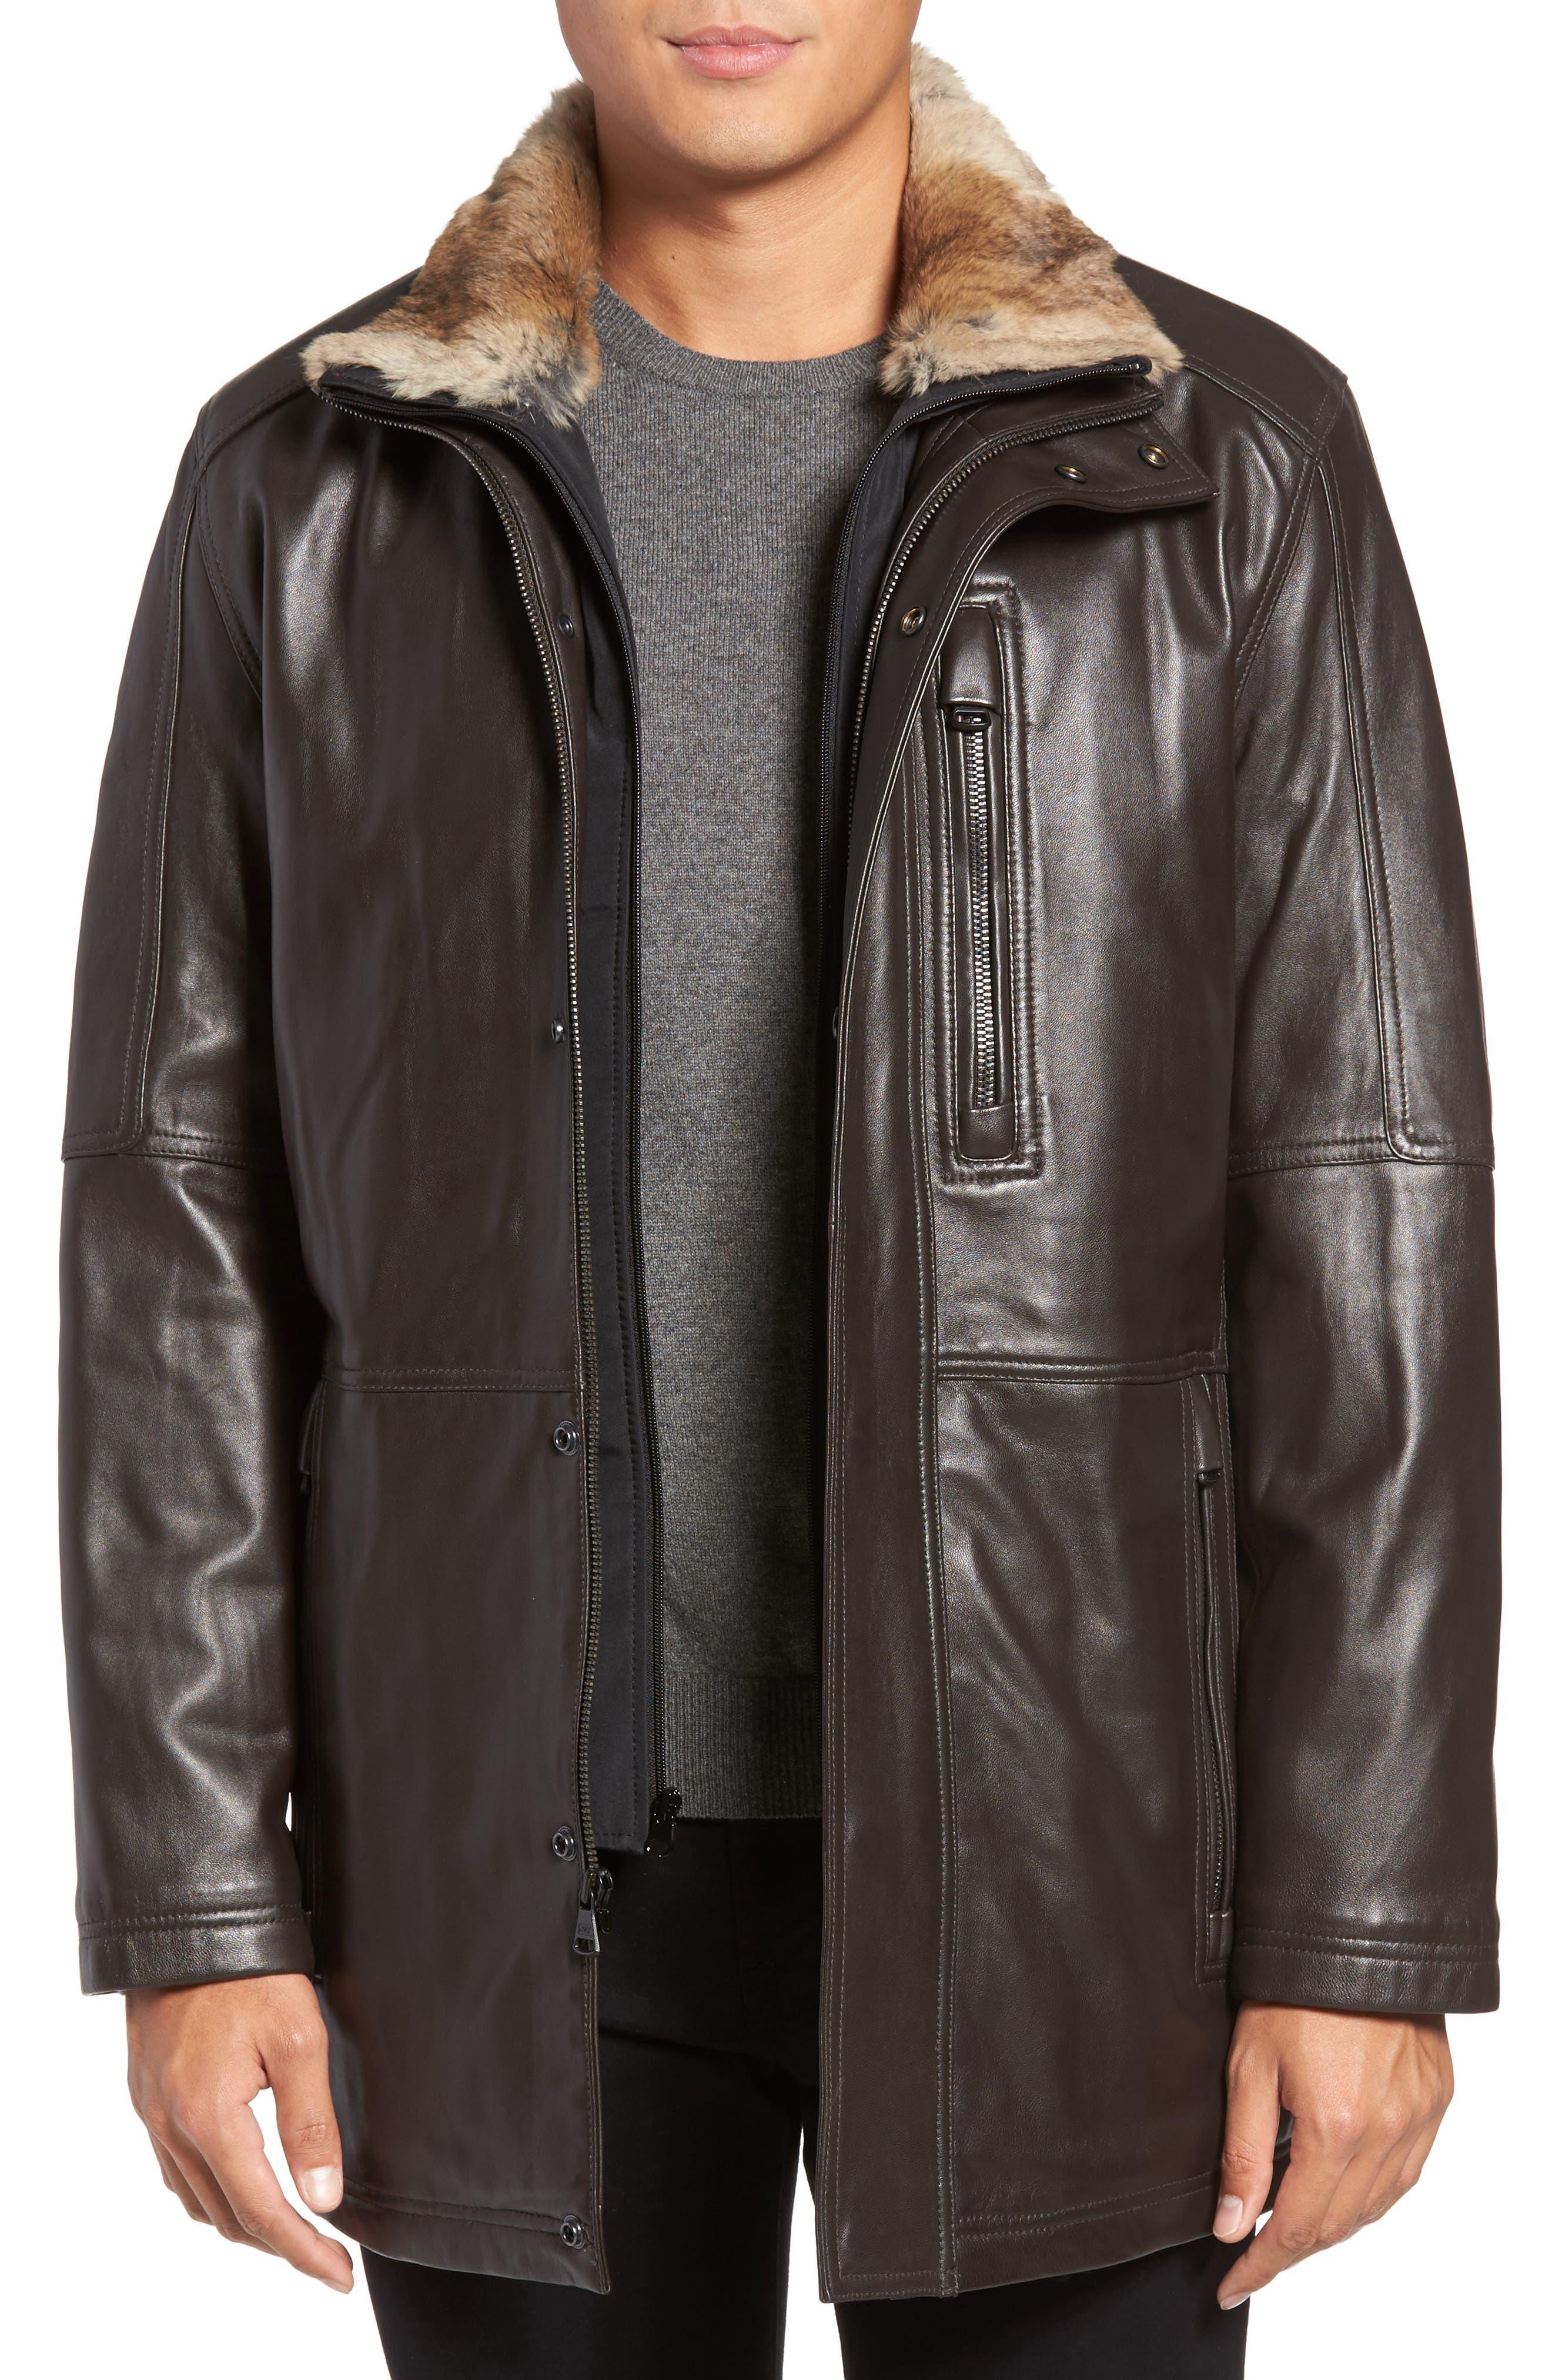 Middlebury Leather Car Coat with Genuine Rabbit Fur Trim,                             Main thumbnail 1, color,                             Espresso